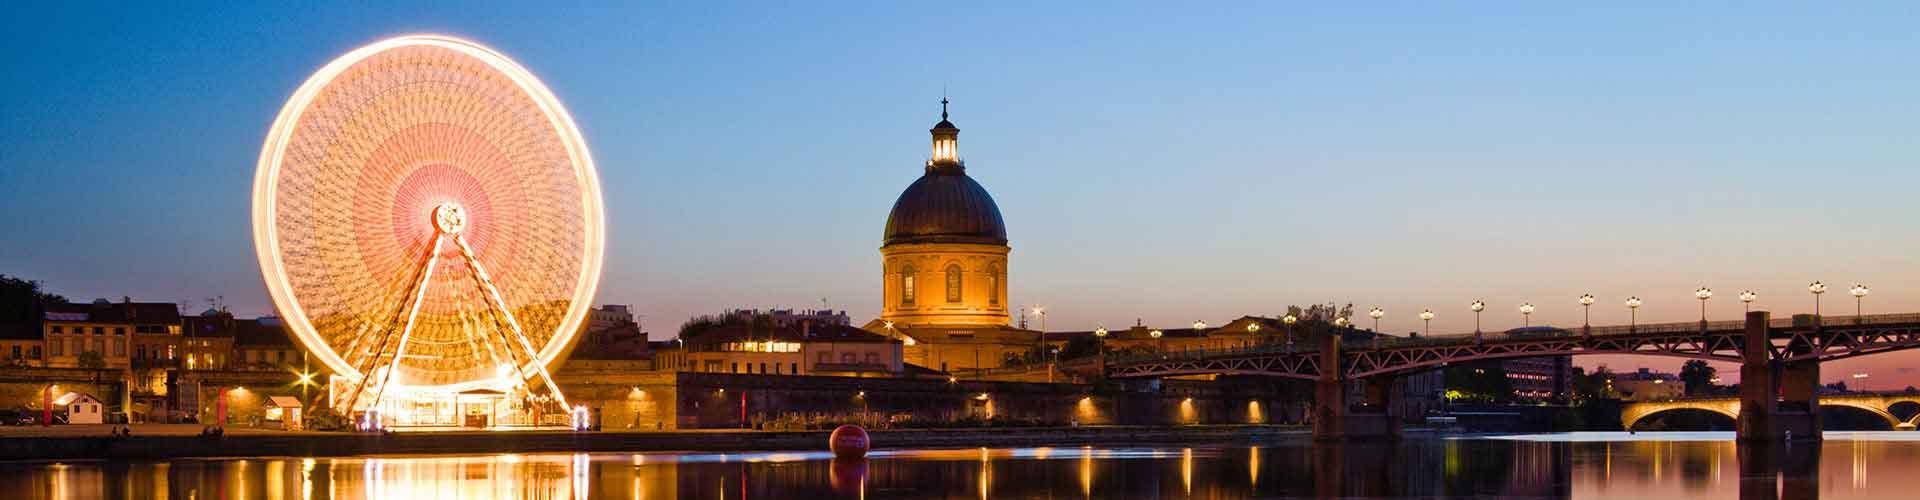 Toulouse - Hostales en el distrito Distrito 14. Mapas de Toulouse, Fotos y comentarios de cada Hostal en Toulouse.